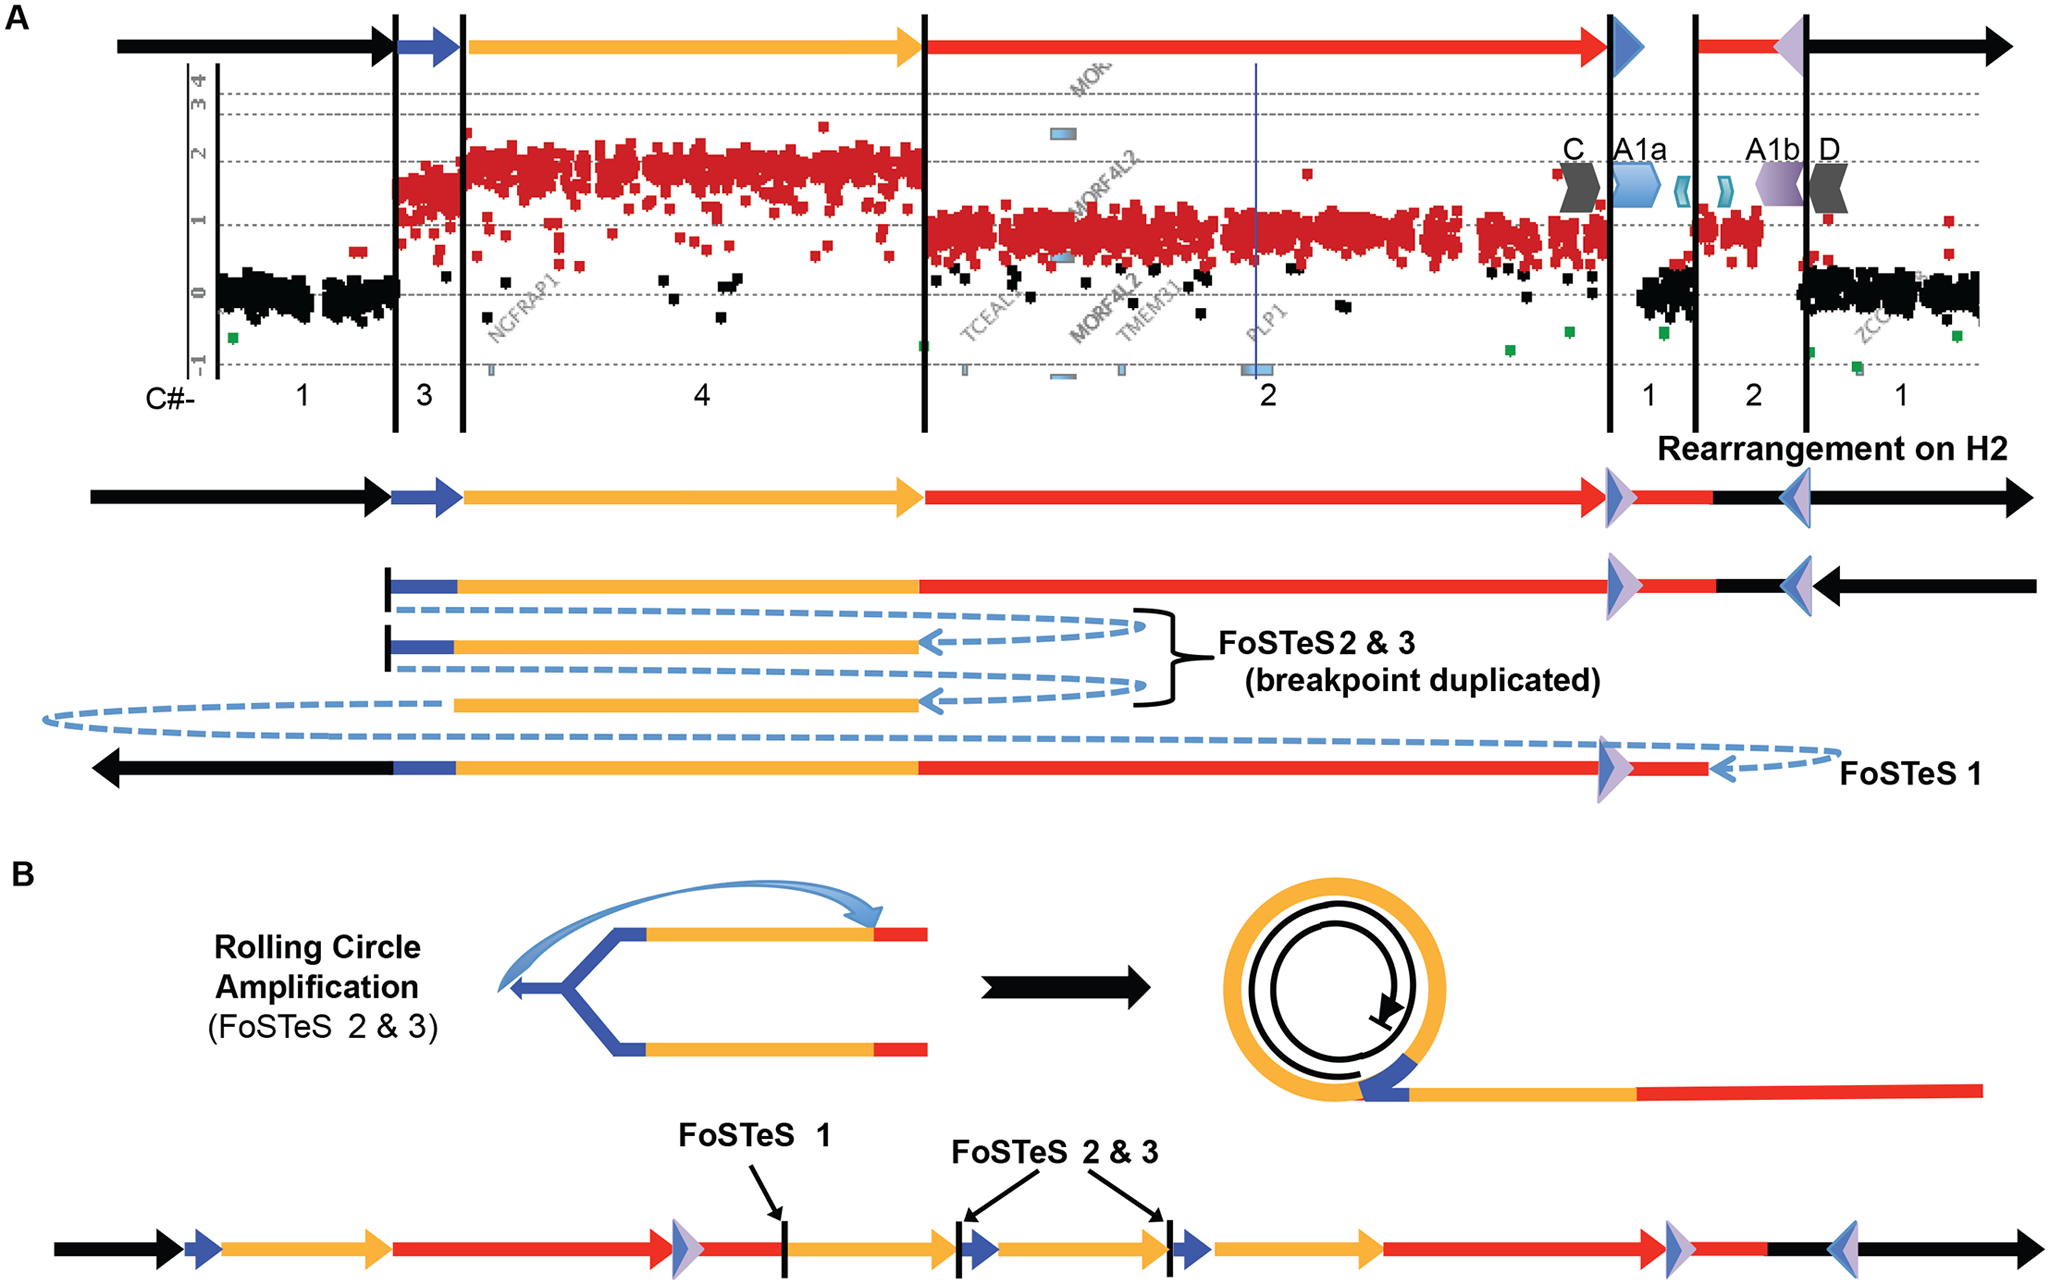 A quadruplication and potential rolling-circle mechanism of rearrangement.